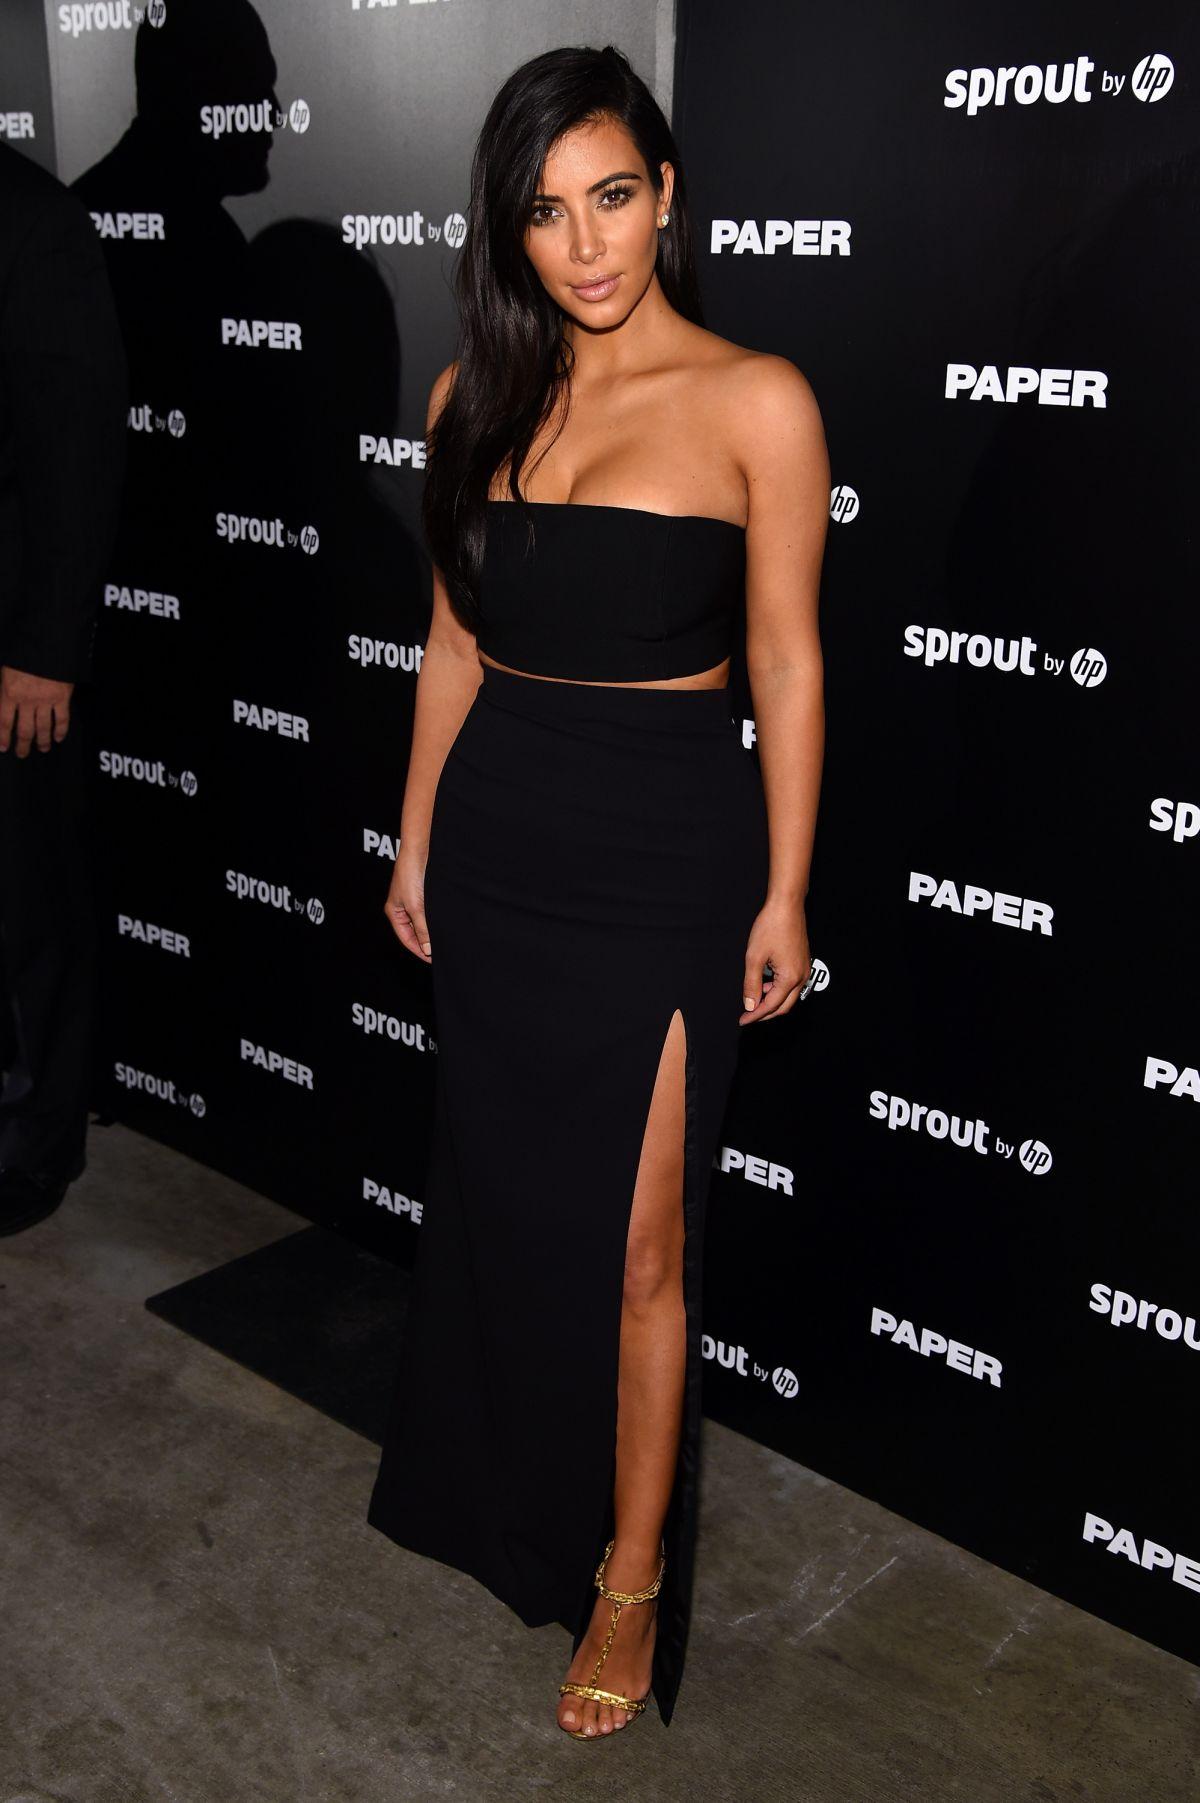 Kim kardashian 224 miami le 12 mars 2014 pour l inauguration d une